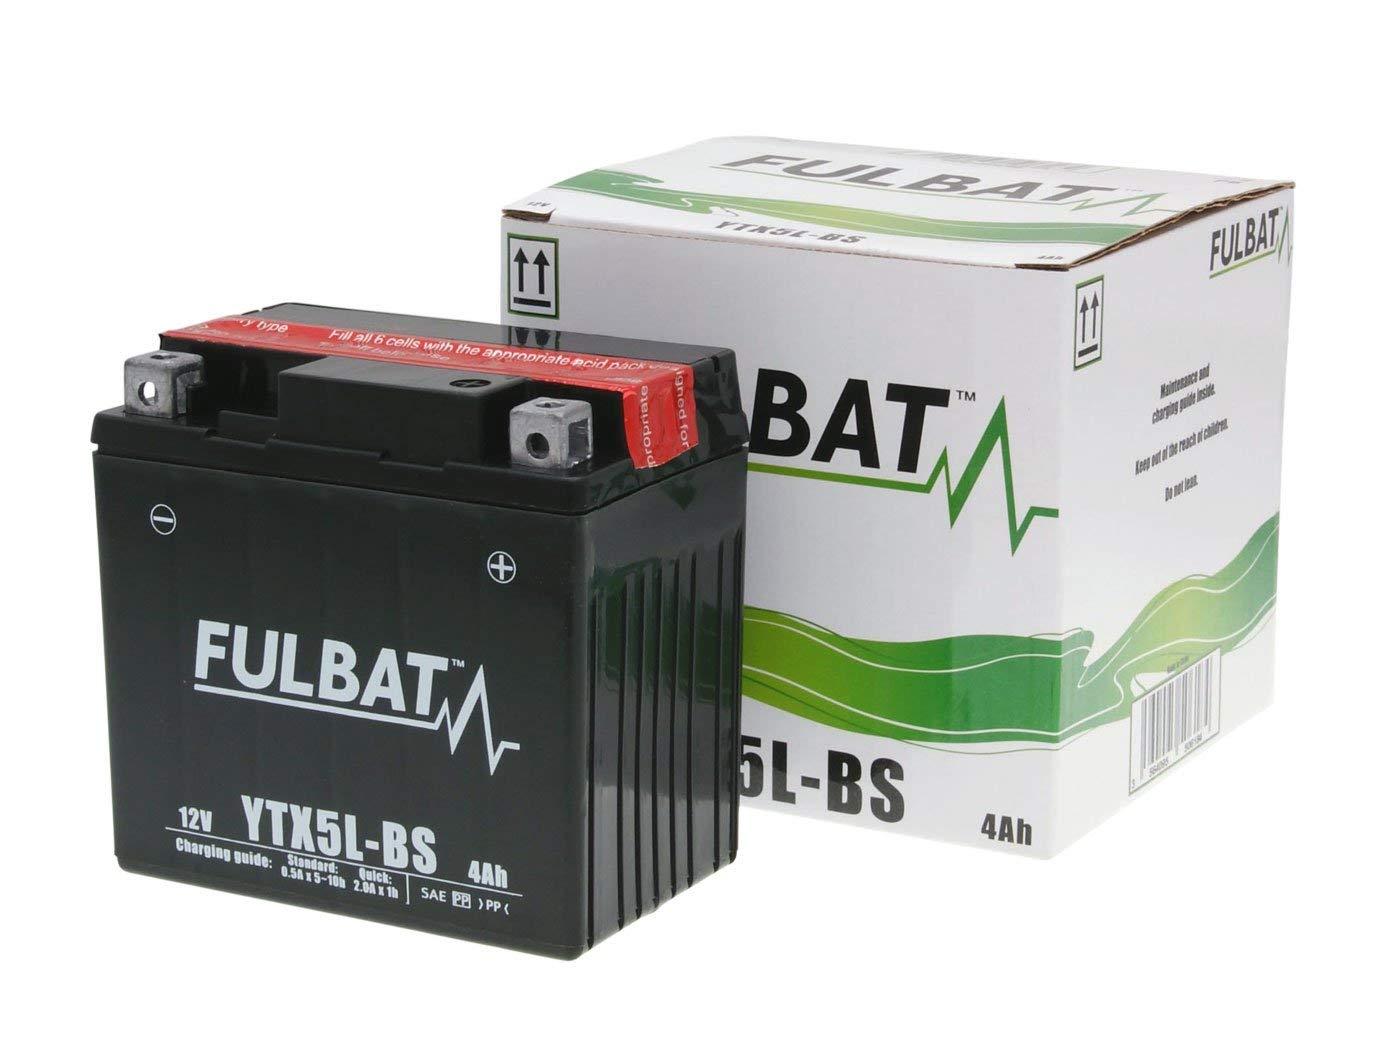 wartungsfrei 12 Volt Batterie 5AH inklusive 7,50 /€ Batteriepfand Keeway RY8 Racing 50